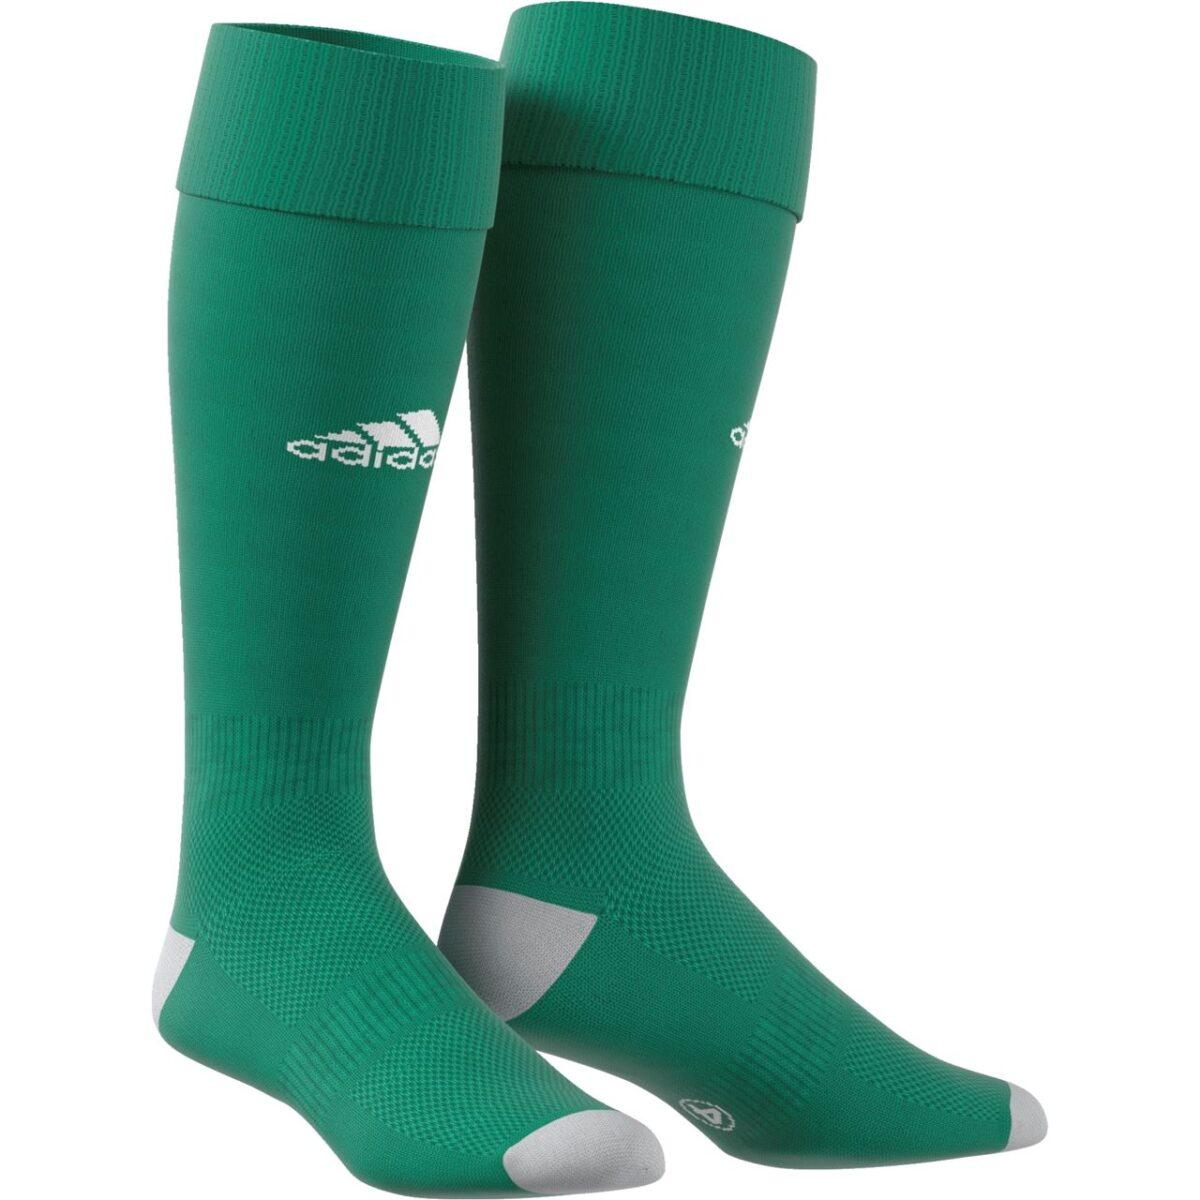 Adidas MILANO 16 Sock